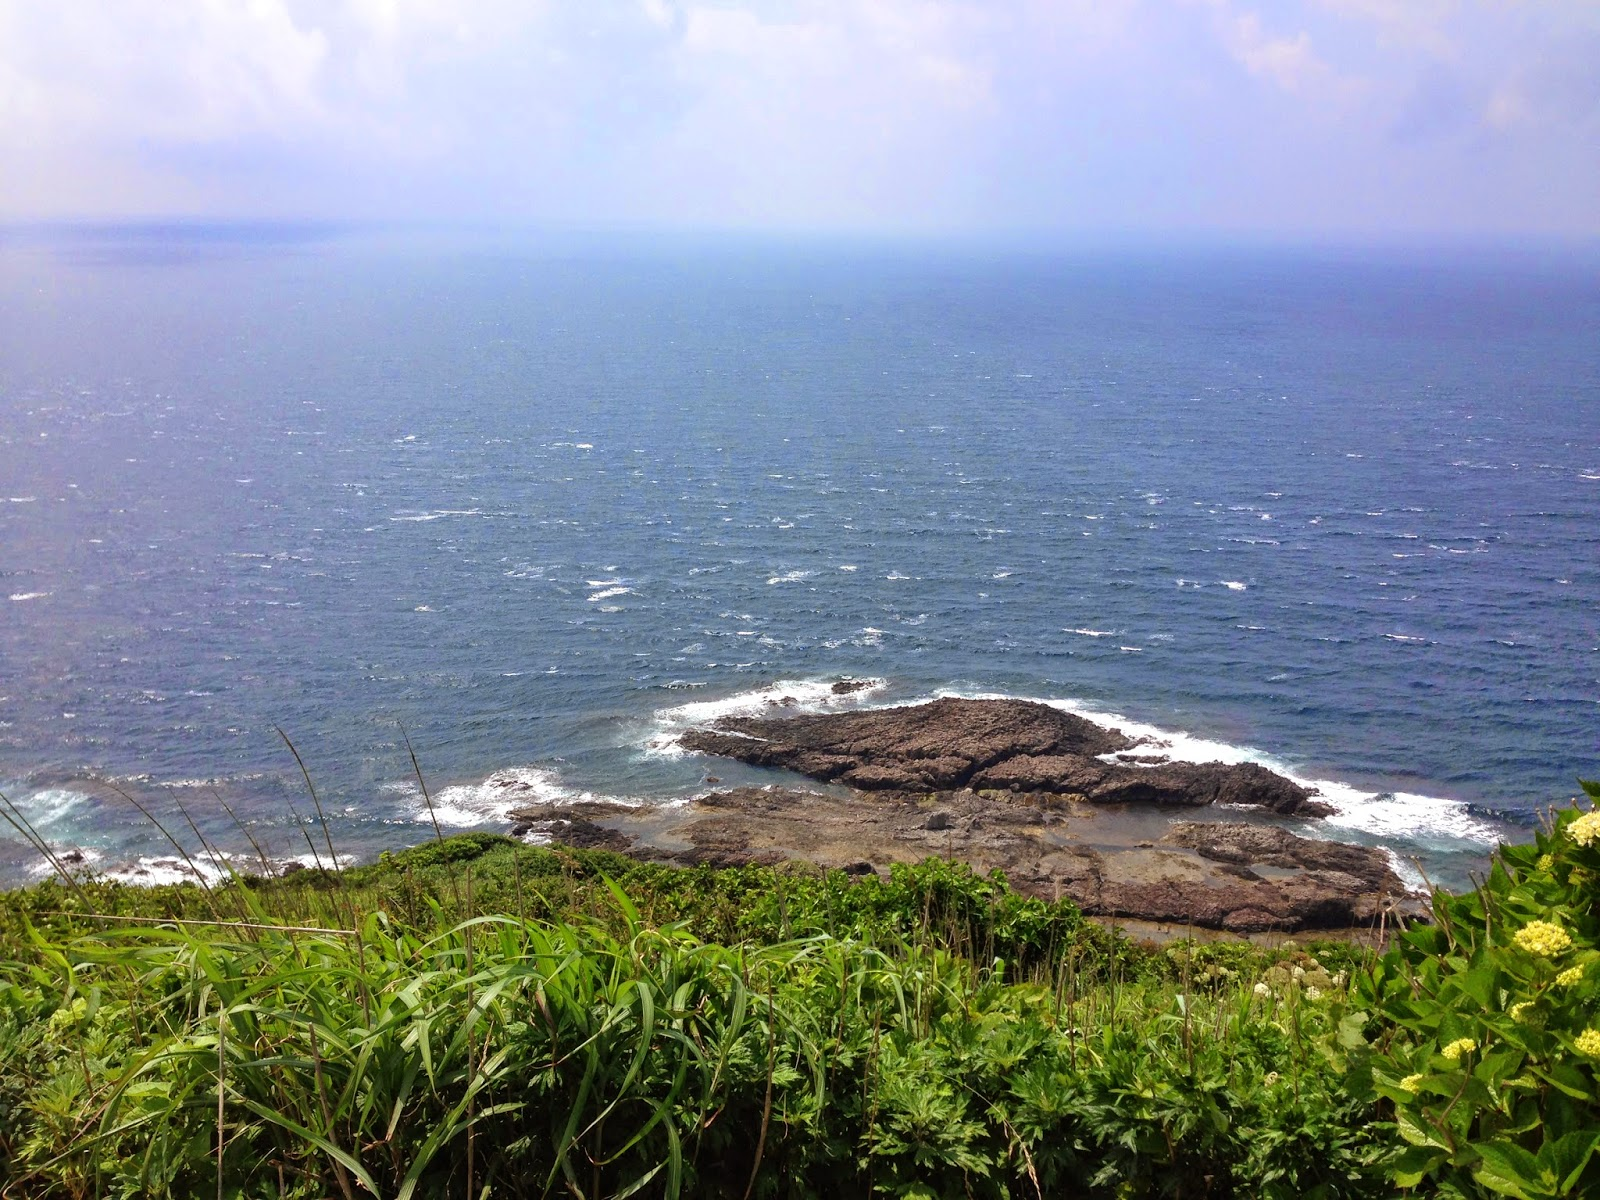 aomori coast, cycling aomori, cycling japan